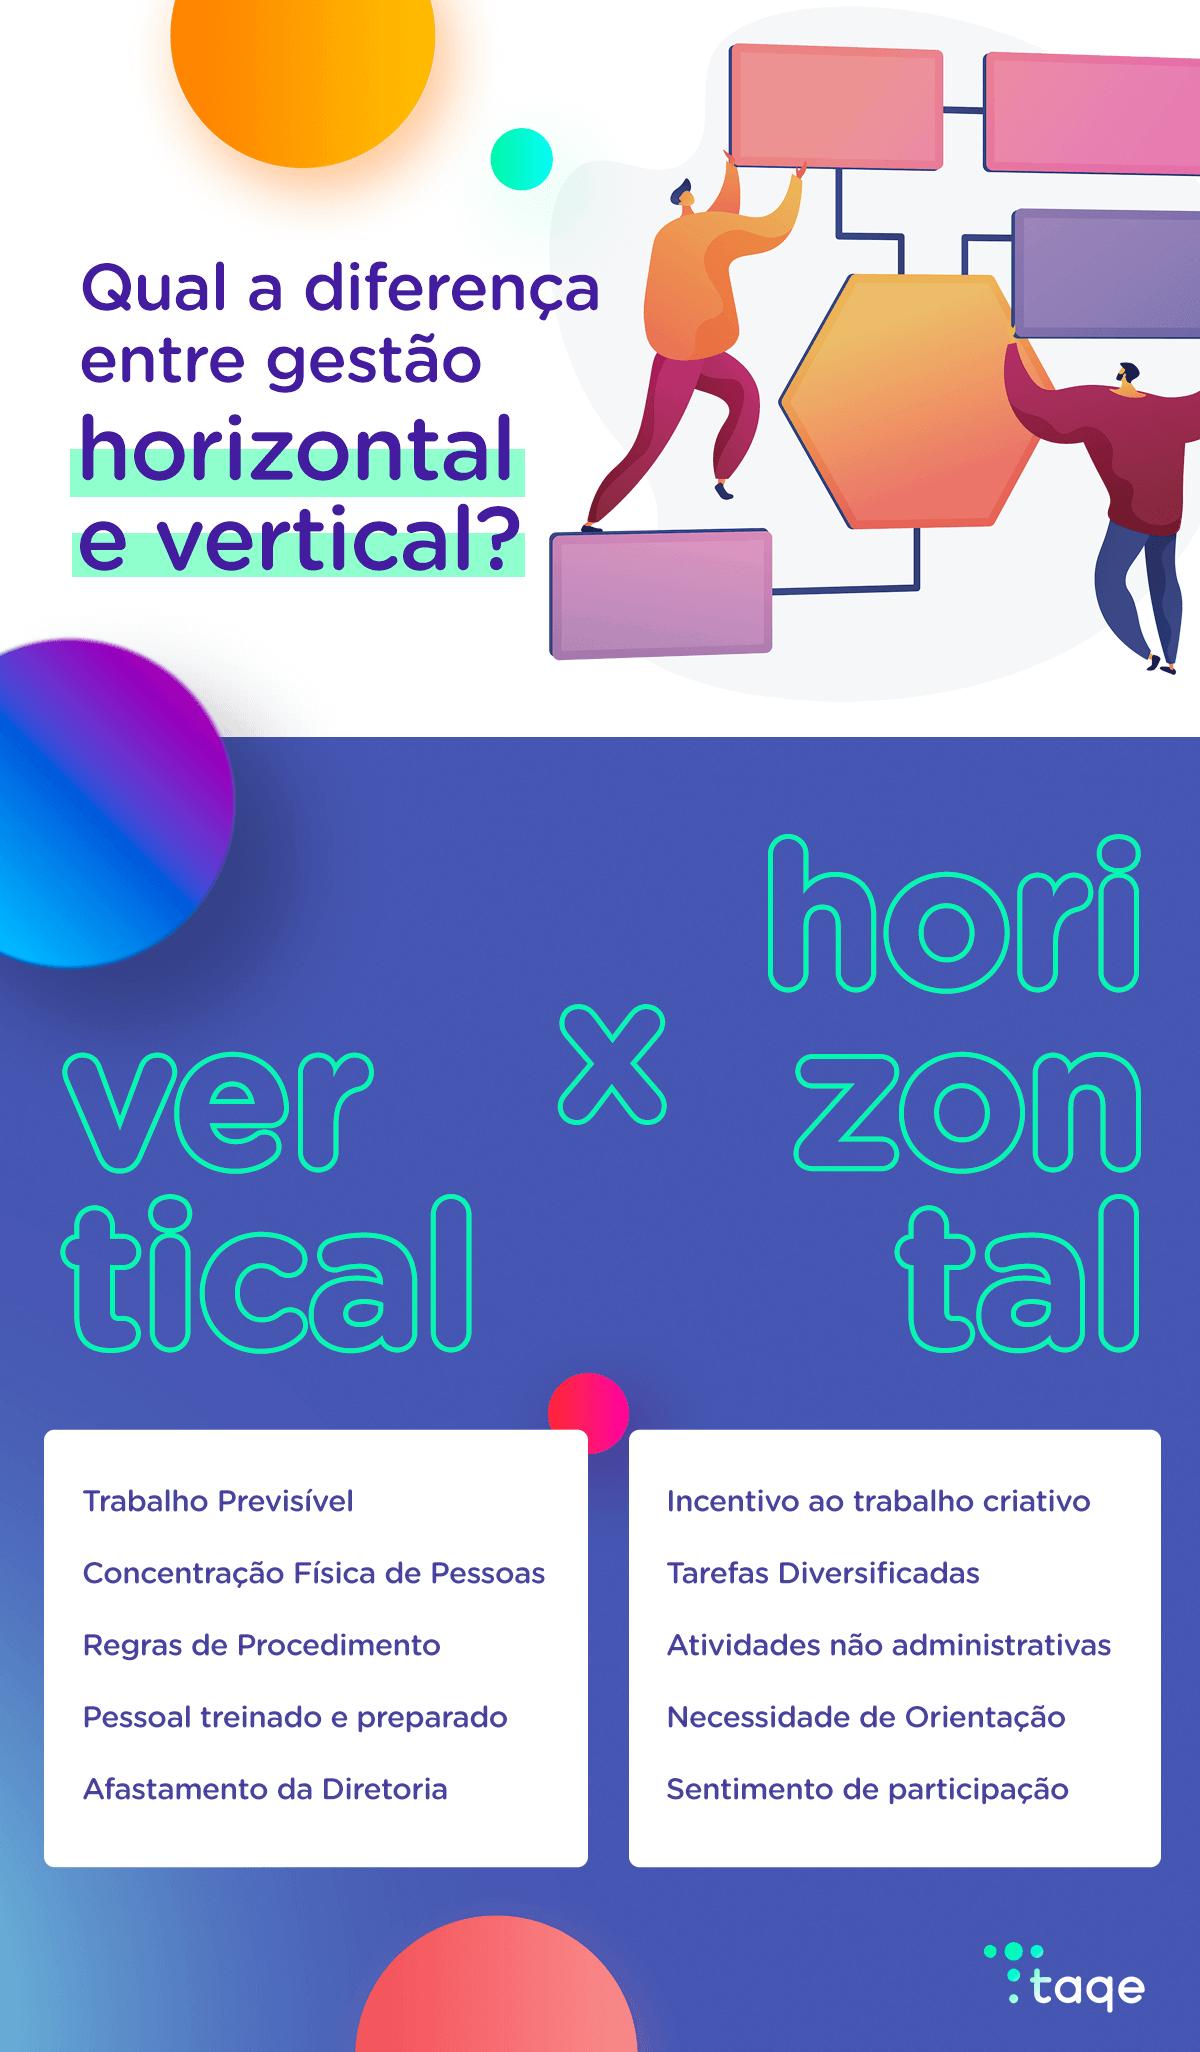 infografico-diferenca-entre-gestao-horizontal-e-vertical